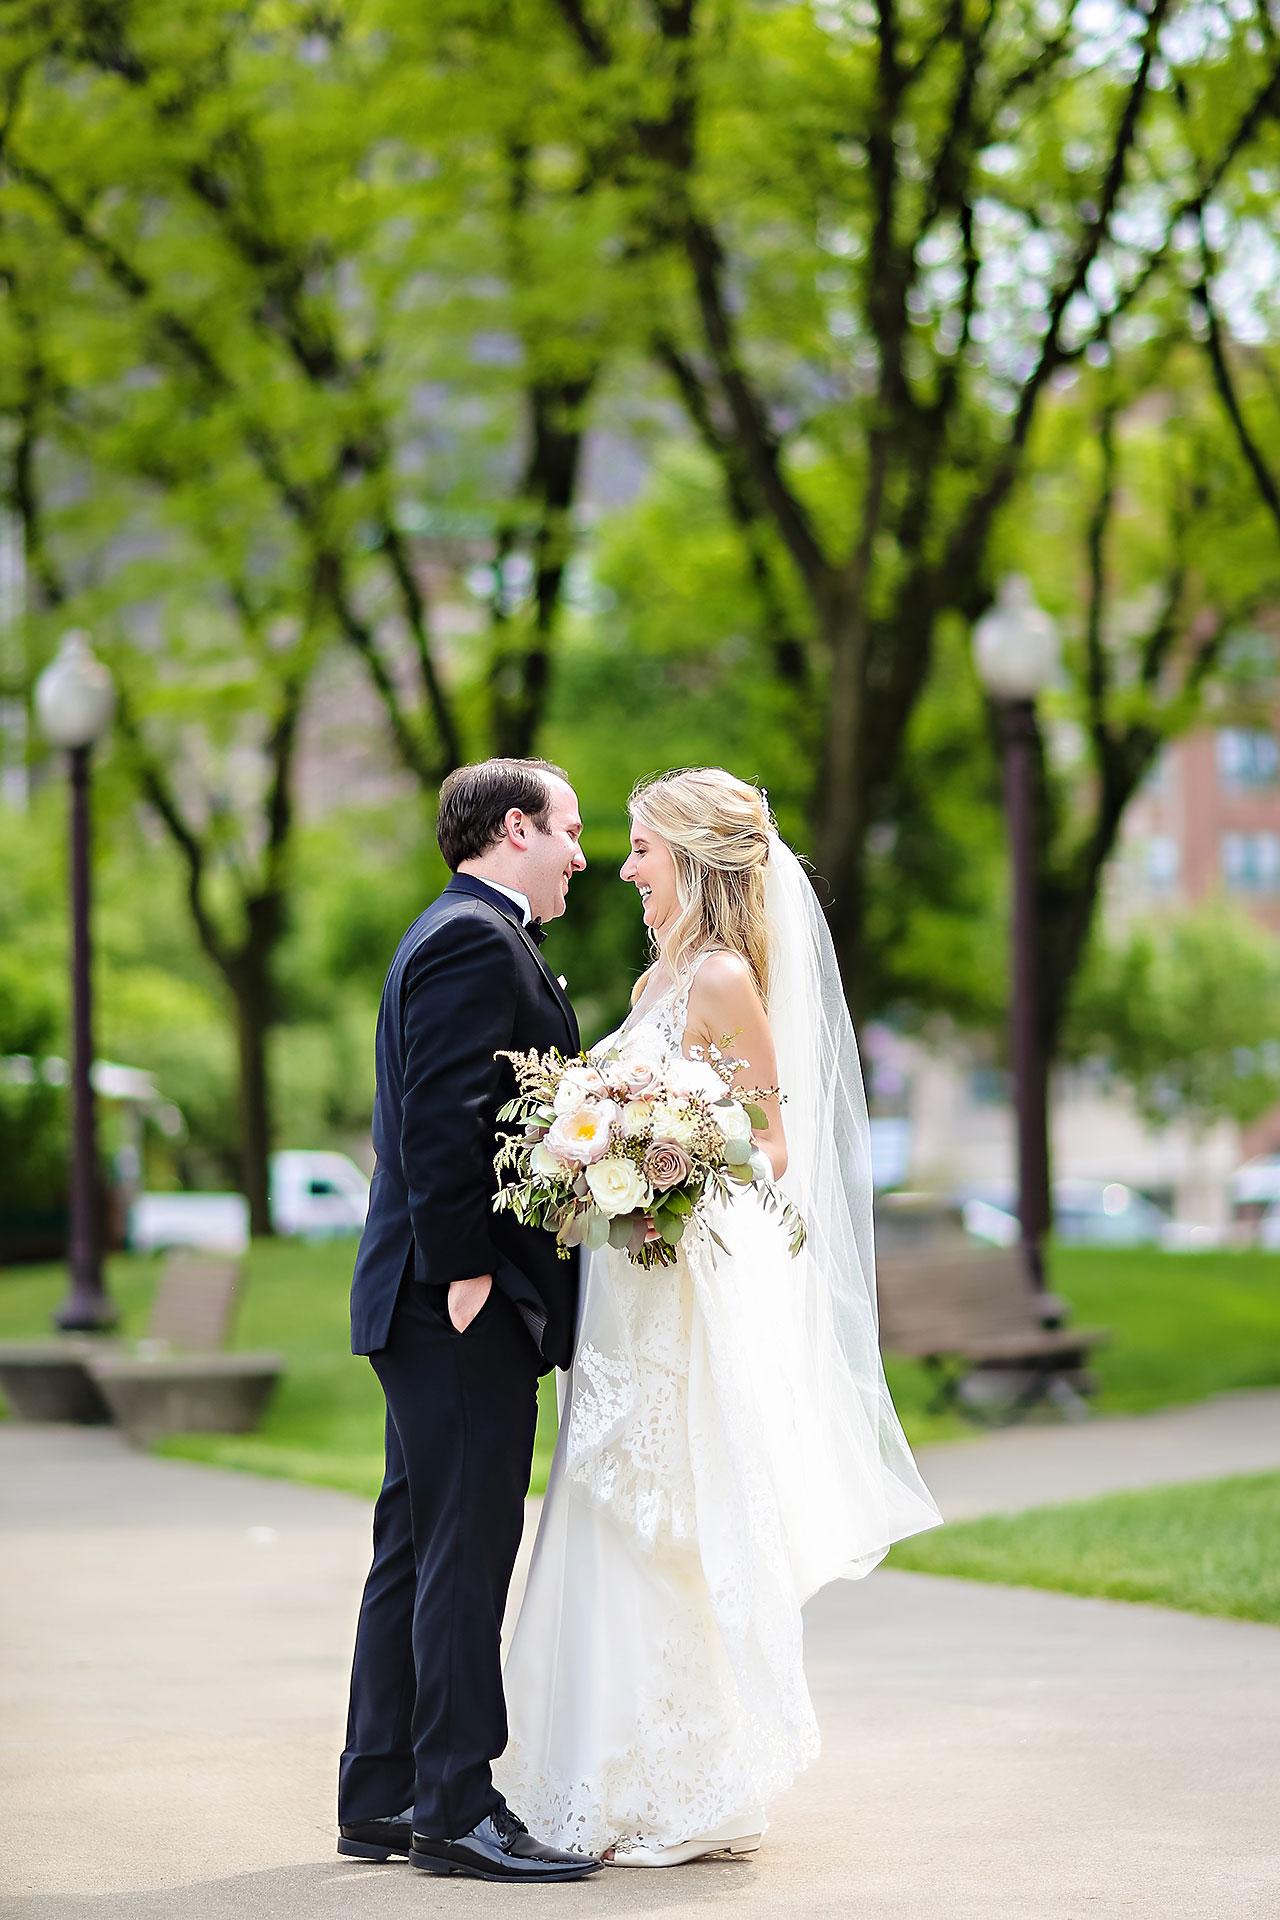 Allison Jeff Union Station Crowne Plaza Indianapolis wedding 193